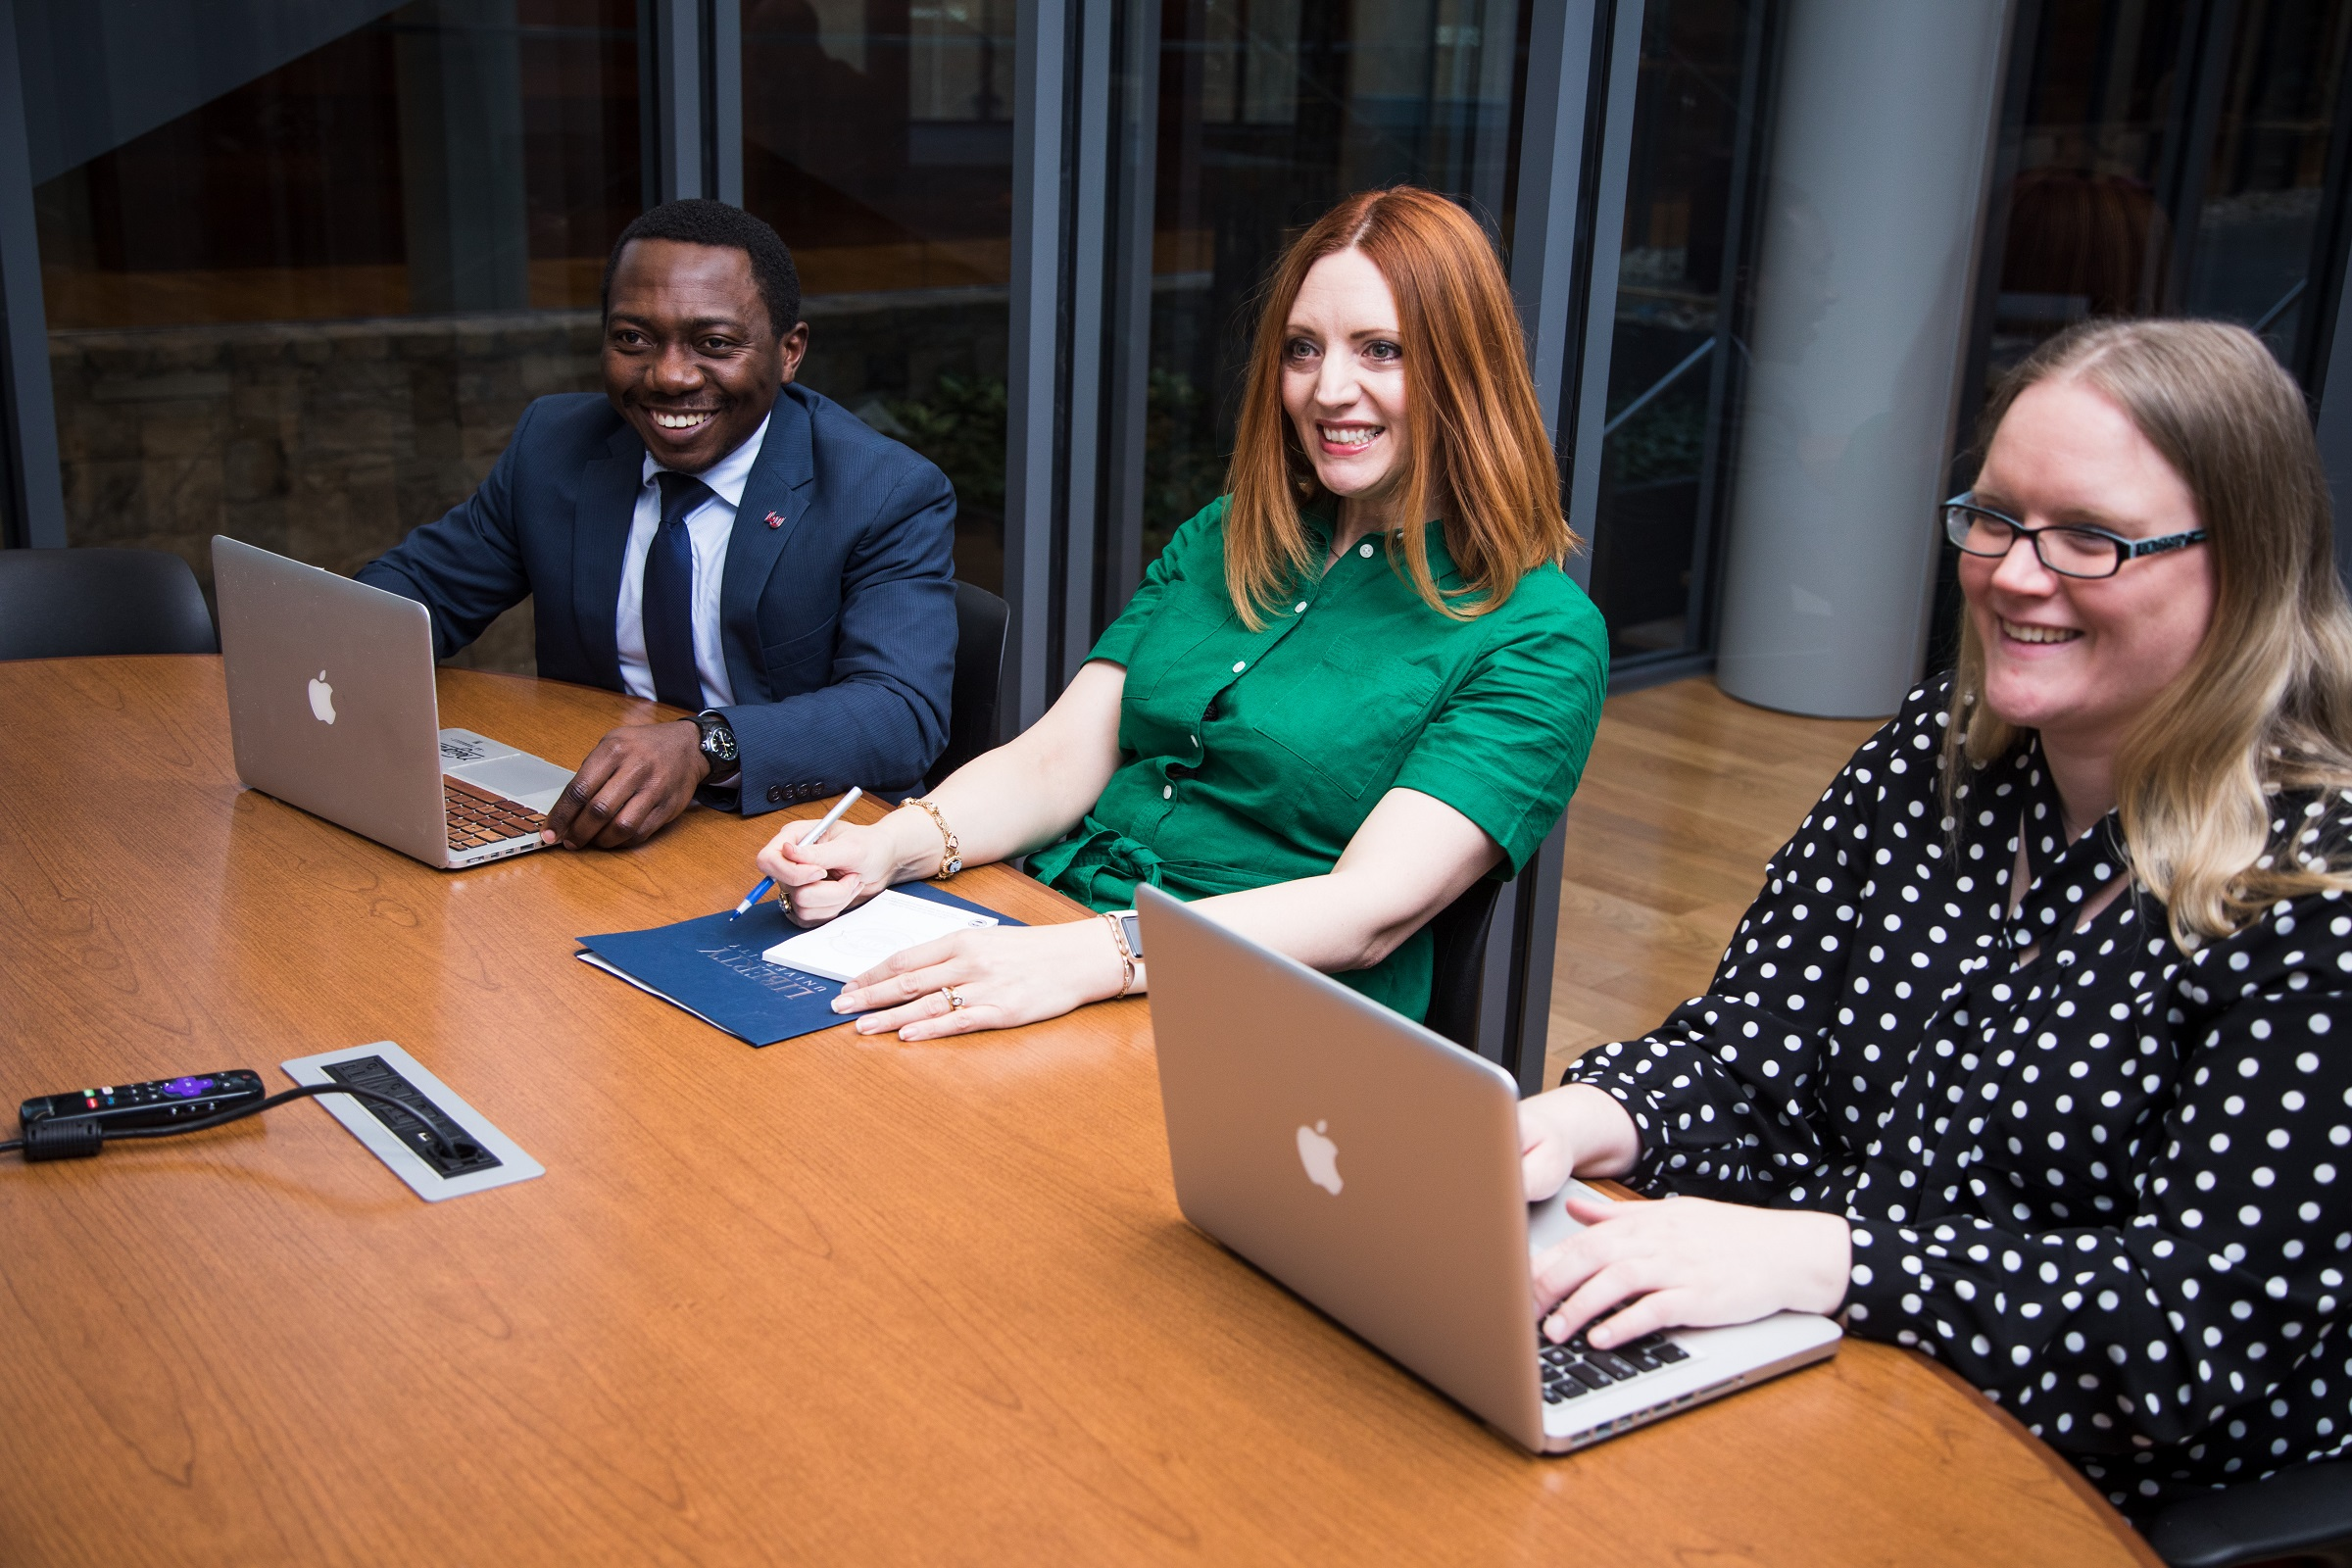 BSBA Business Communication Degree Online